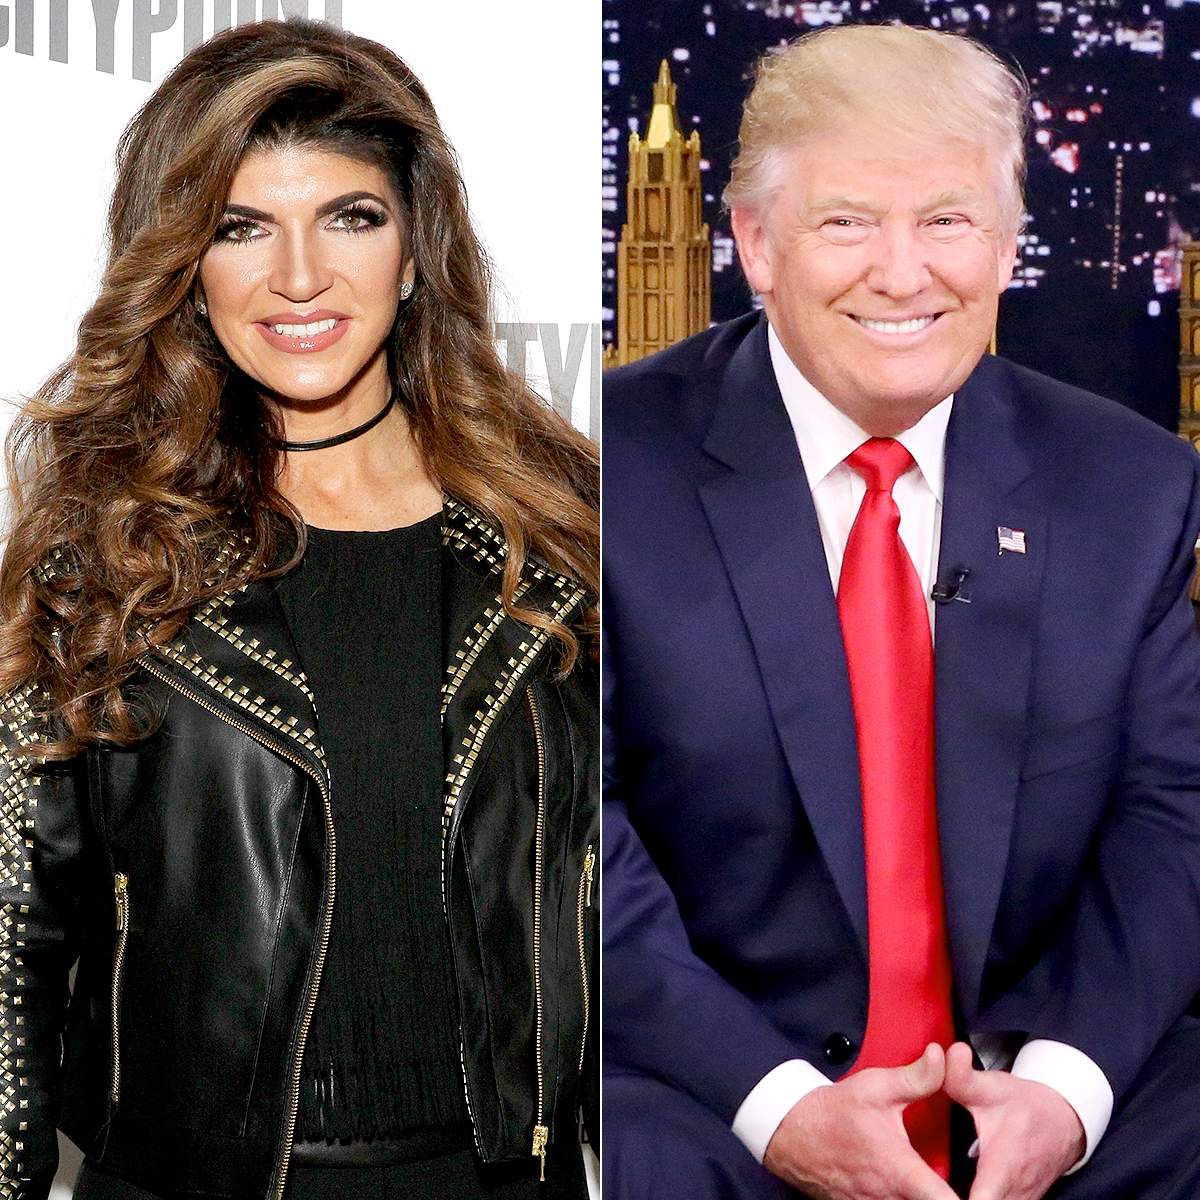 Teresa Giudice and Donald Trump